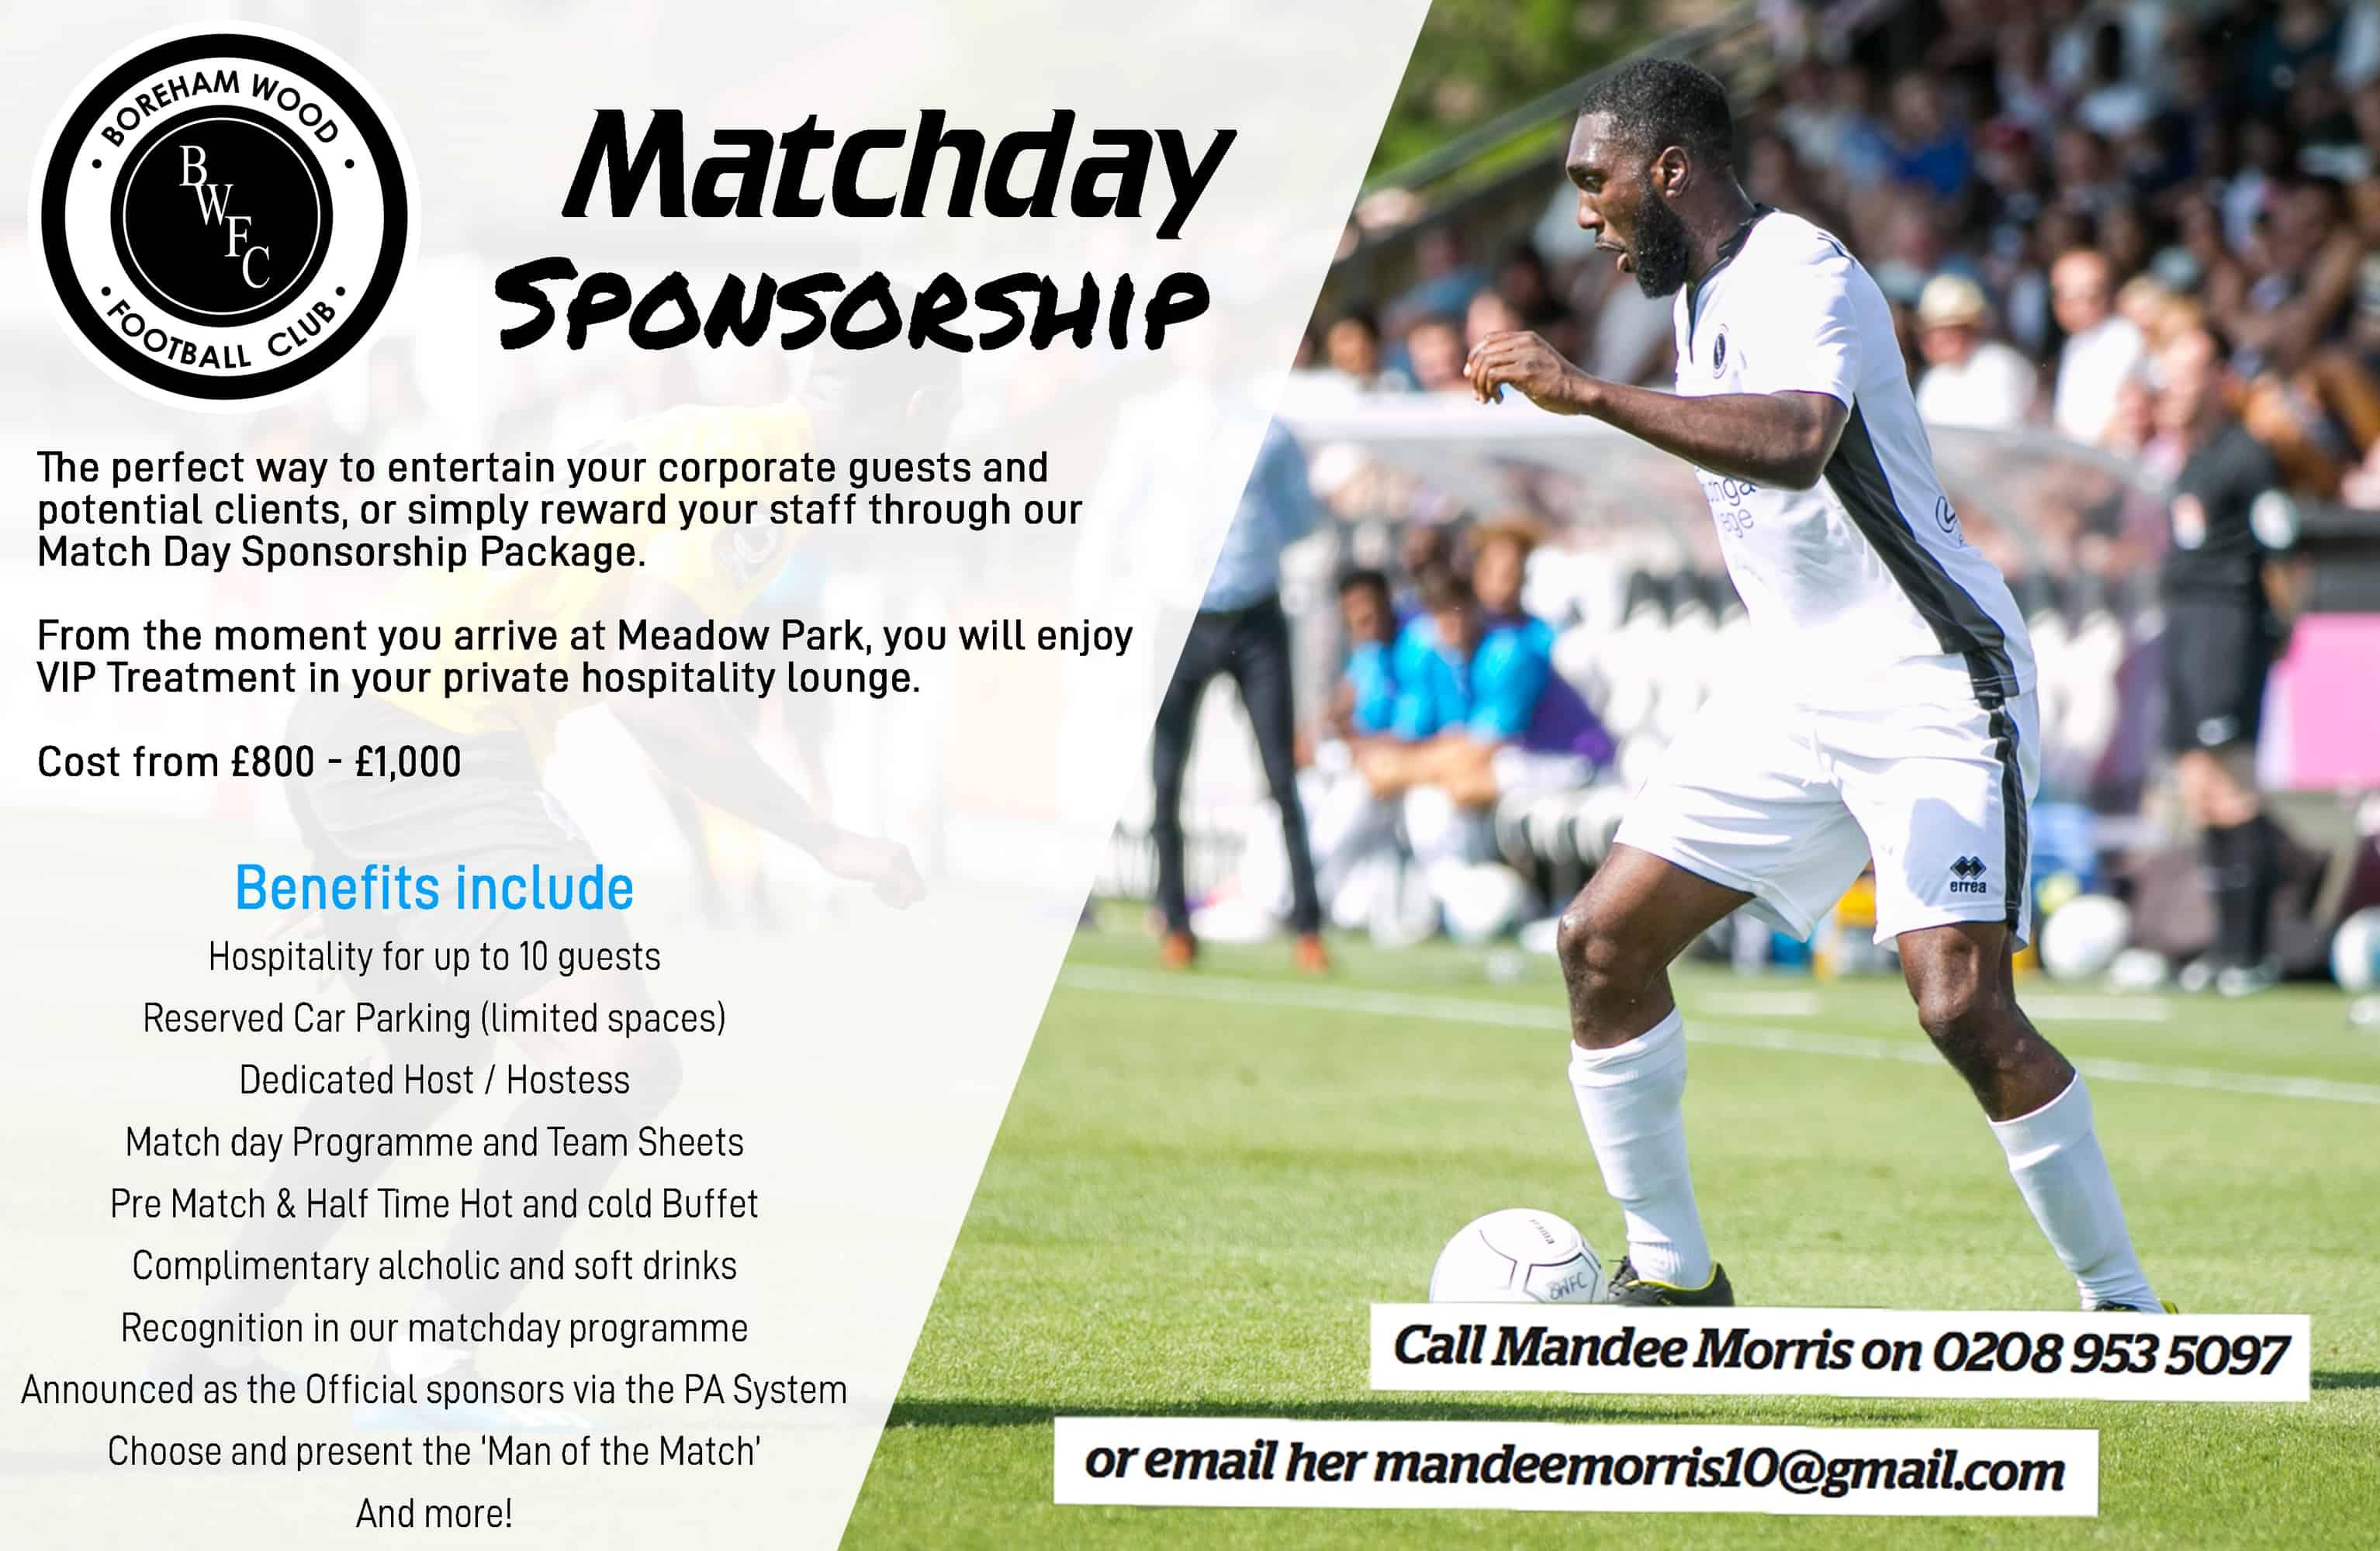 Match Sponsorship | Boreham Wood Football Club